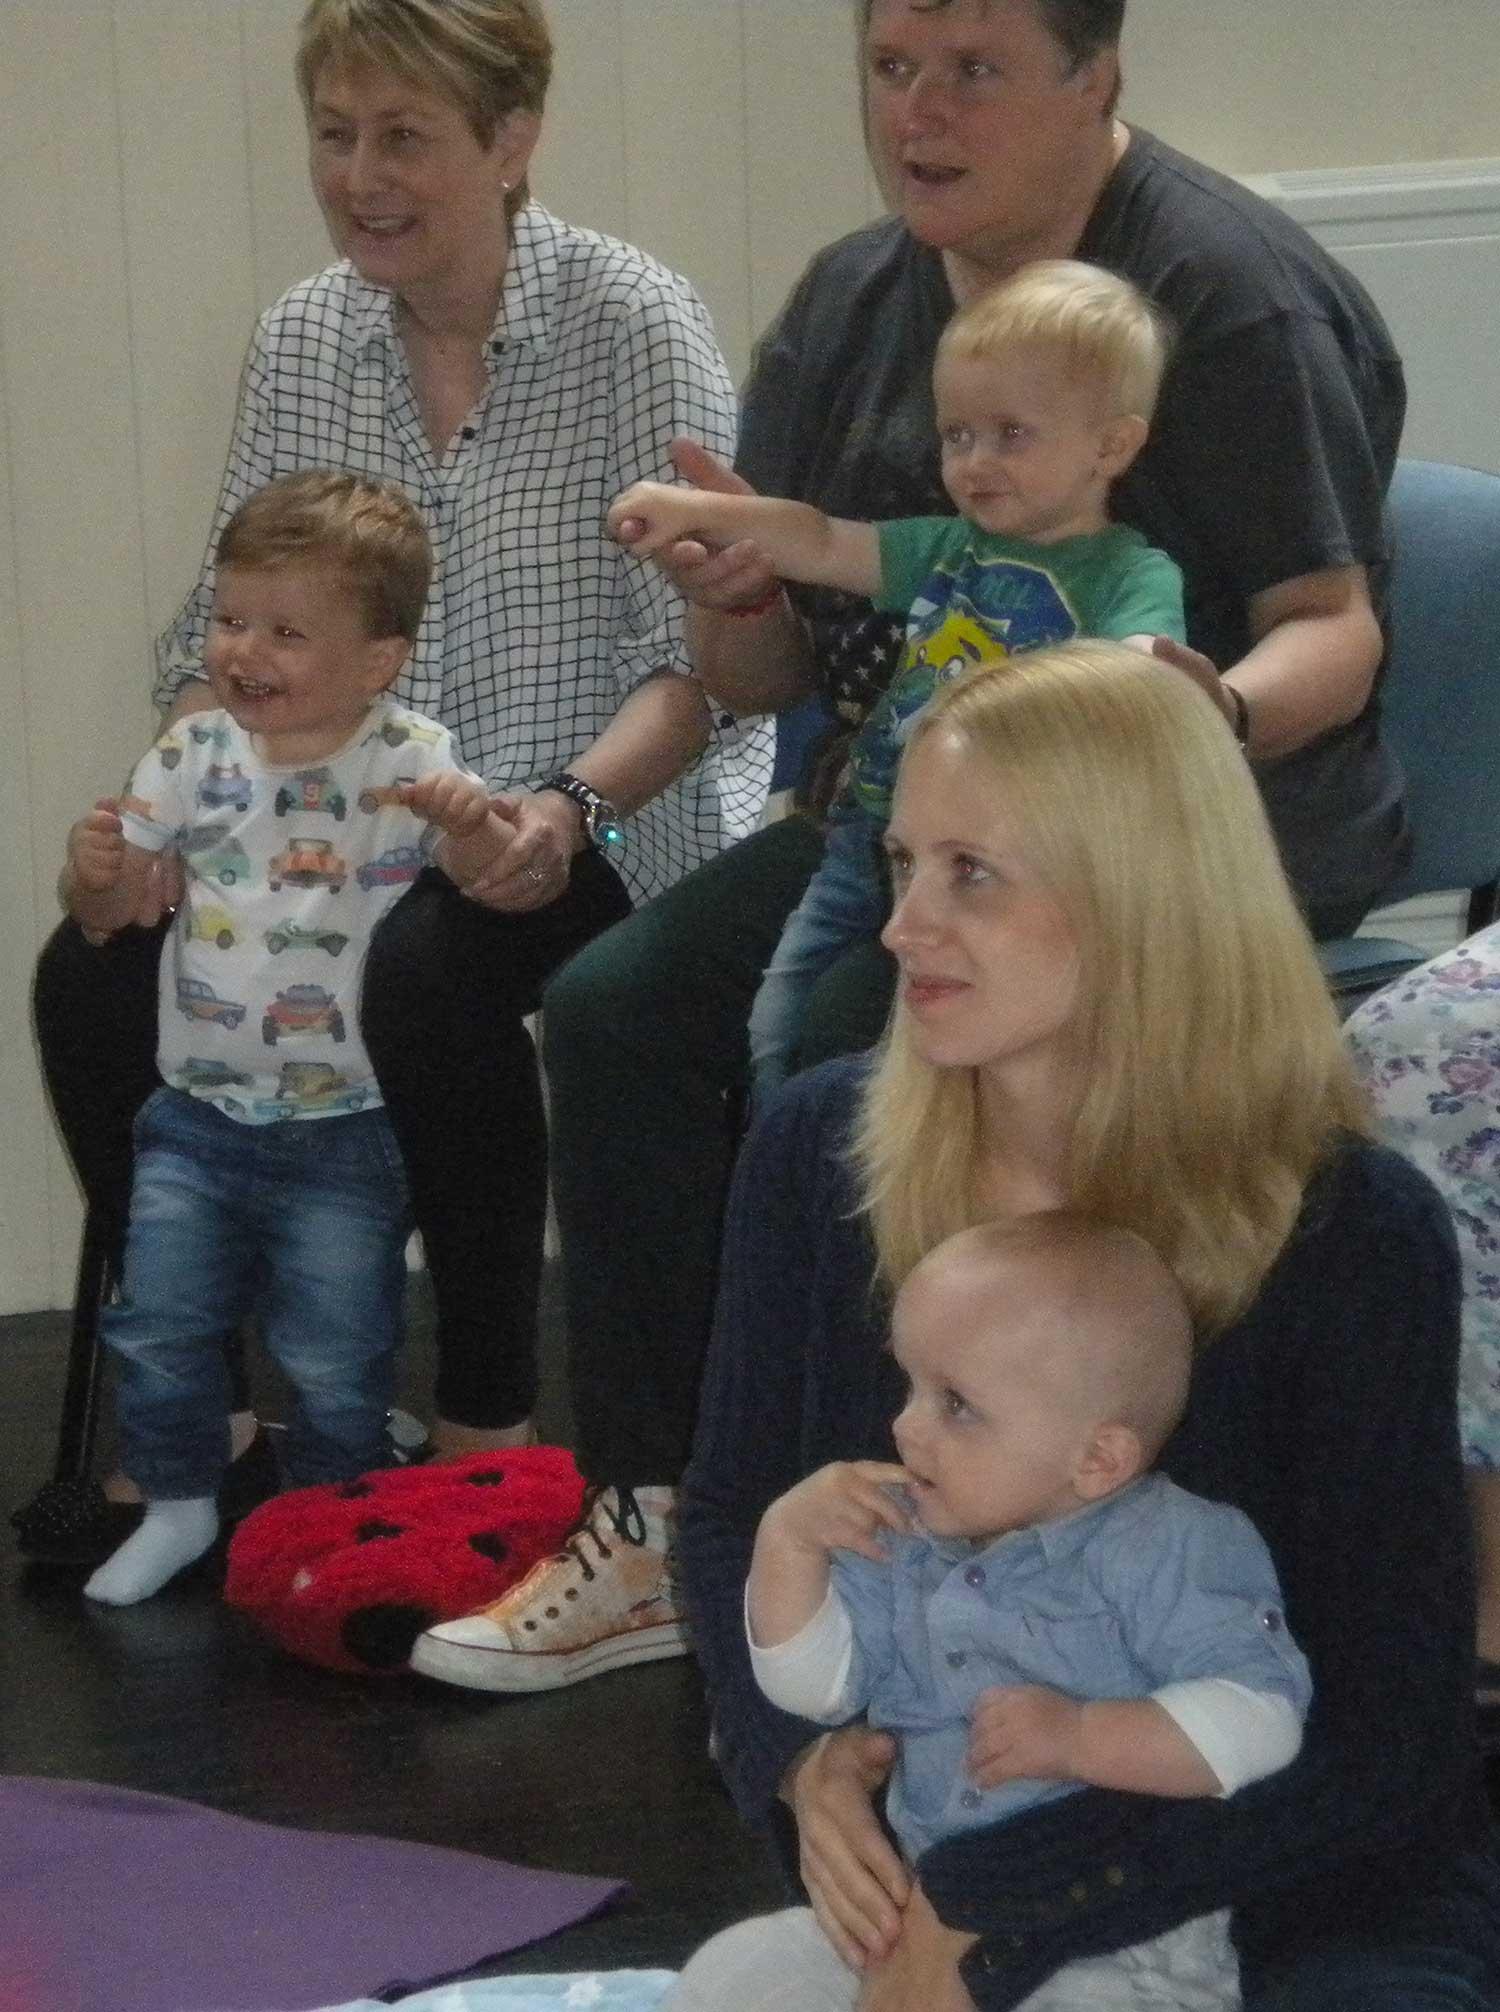 Musitots audience watching Rachel